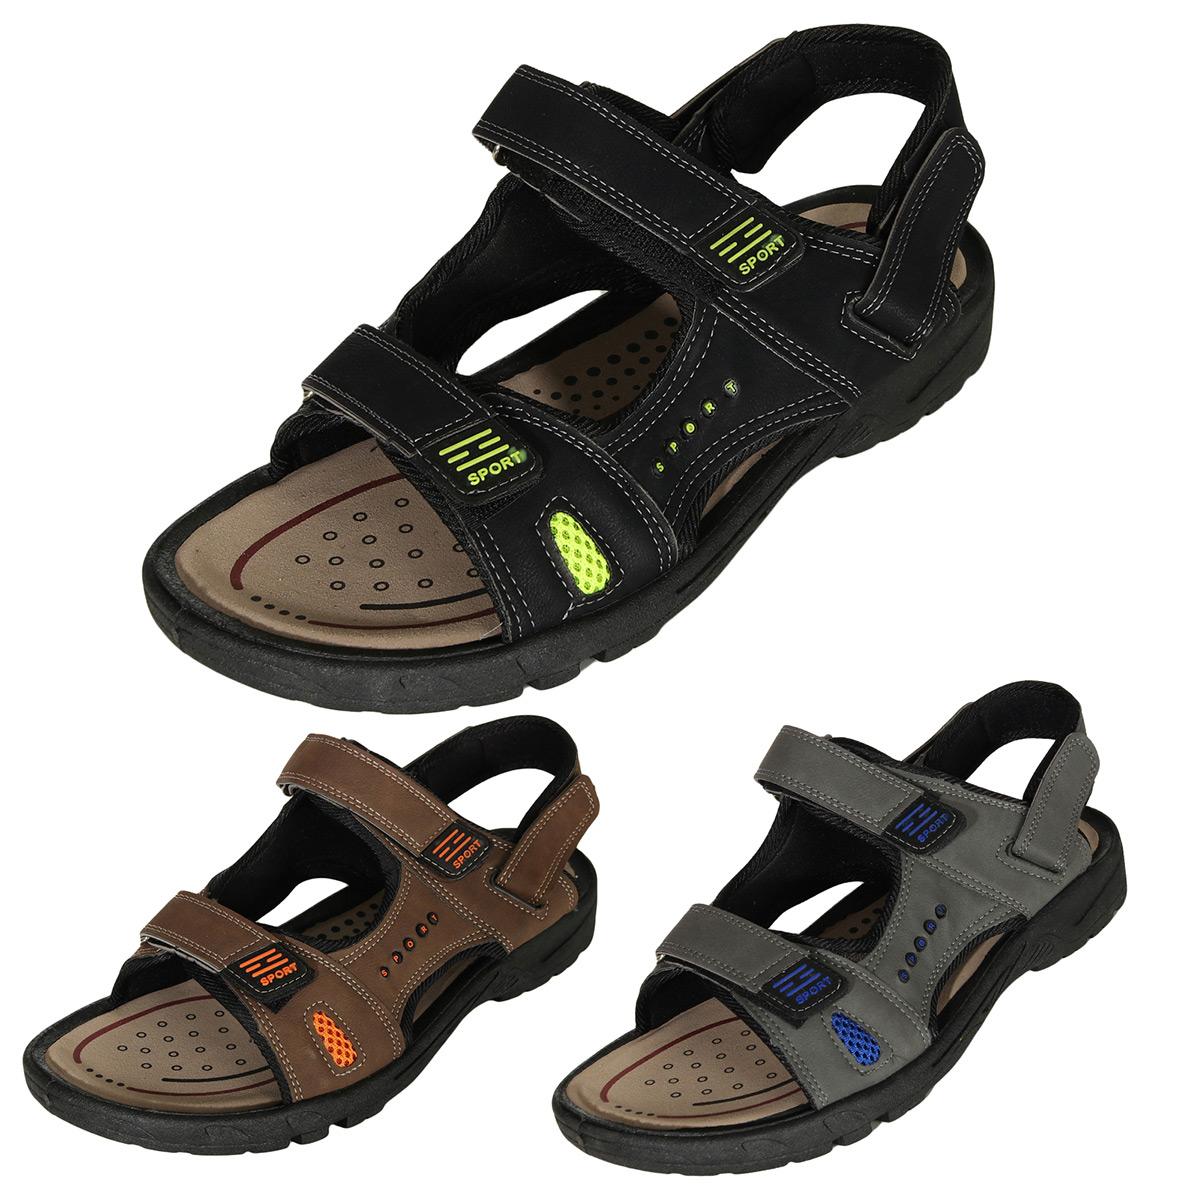 Neu Herrenschuhe Eur 44 Sandalen Komfortable Slipper Pantoletten Sandaletten Cp2 Sandalen Kleidung & Accessoires